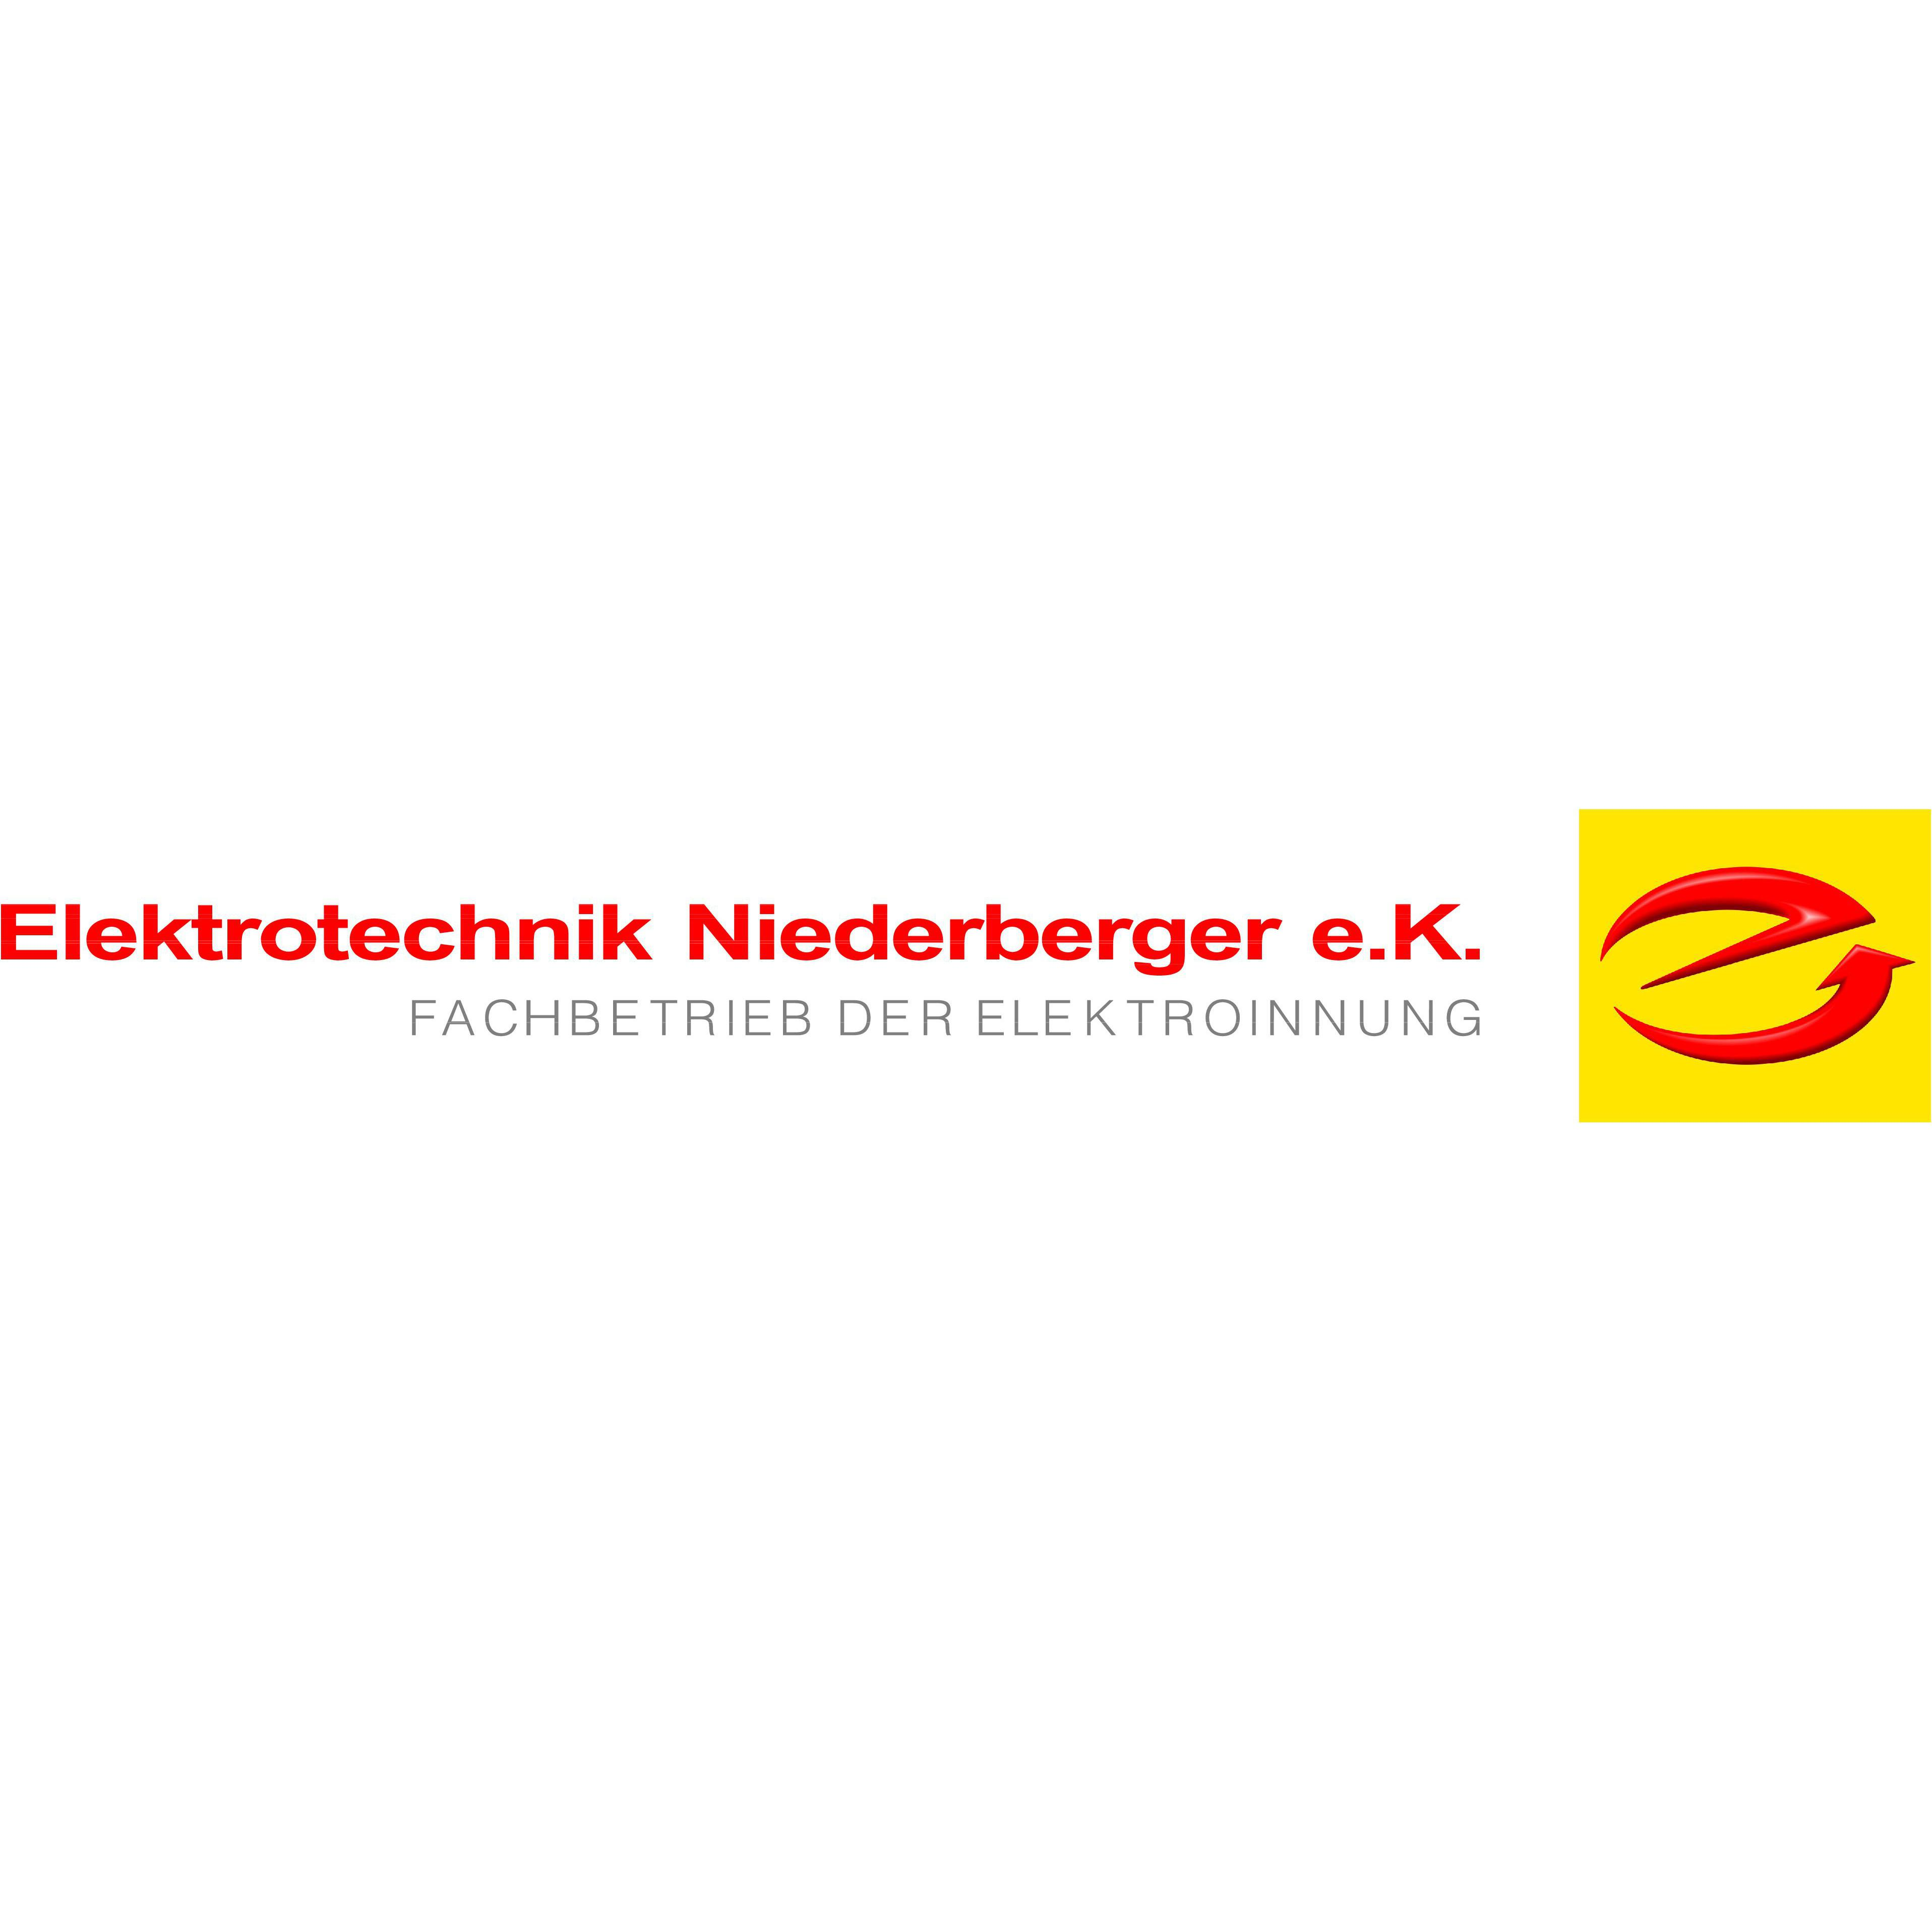 Bild zu Elektrotechnik Niederberger e. K. in Nürnberg